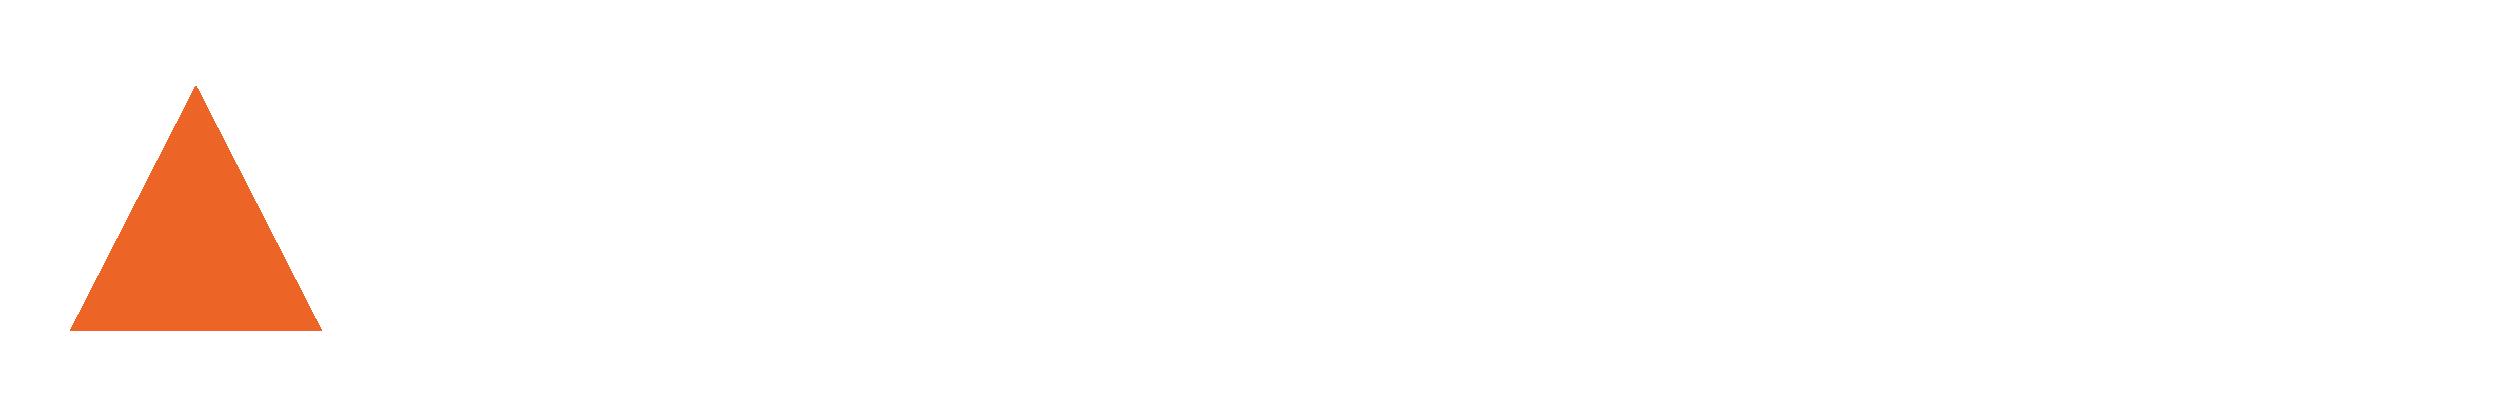 Calow Creative